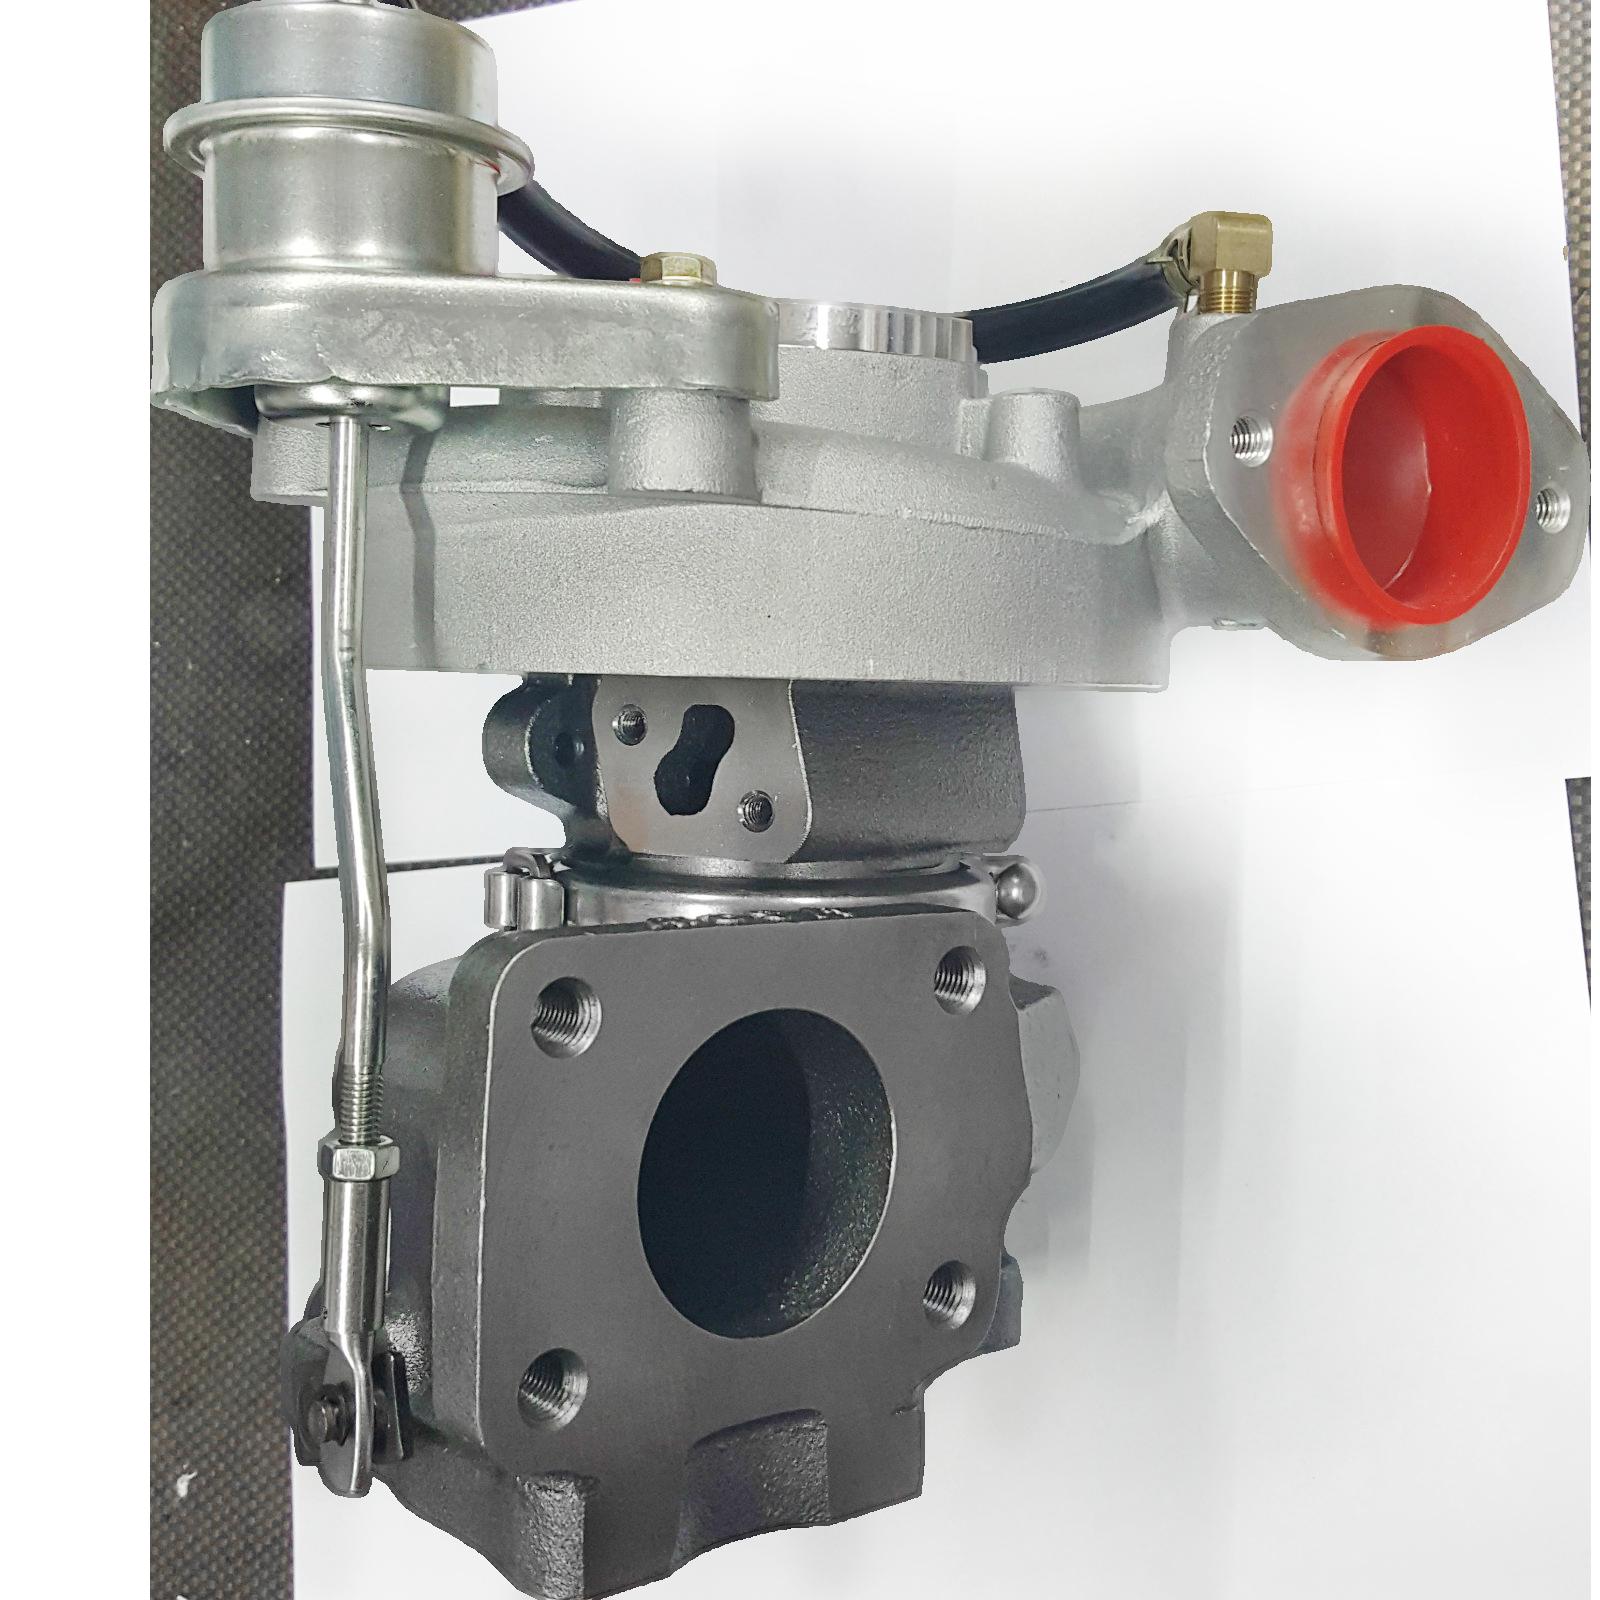 ct15b turbo Turbocharger Turbine for Toyota Chaser Cresta Mark II Tourer V JZX100 1JZ-GTE 17201-46040 1720146040 1720146040